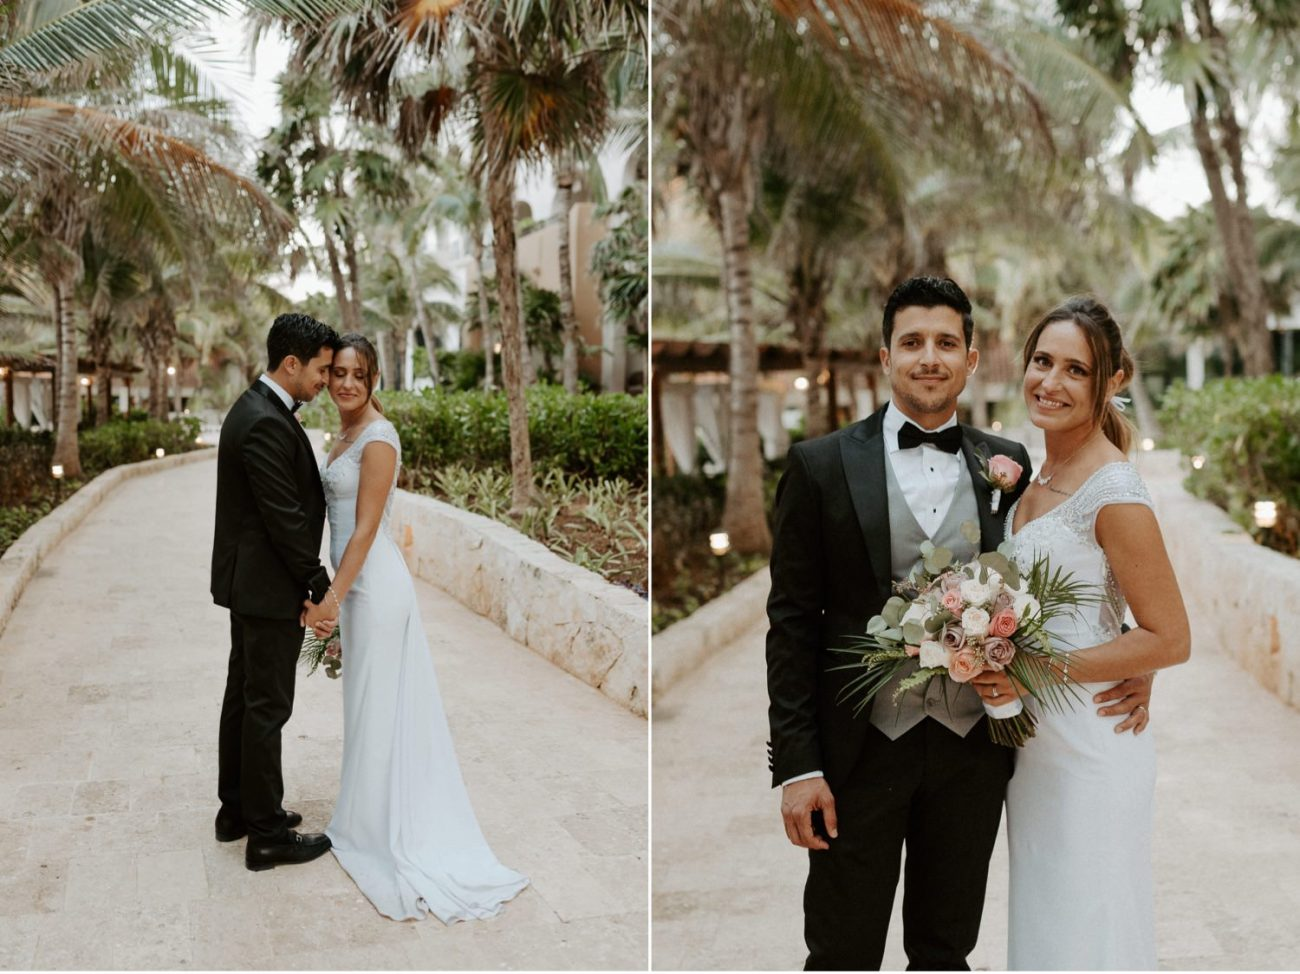 Cancun Destination Wedding Mexico Tulum Wedding Photographer Anais Possamai Photography 054